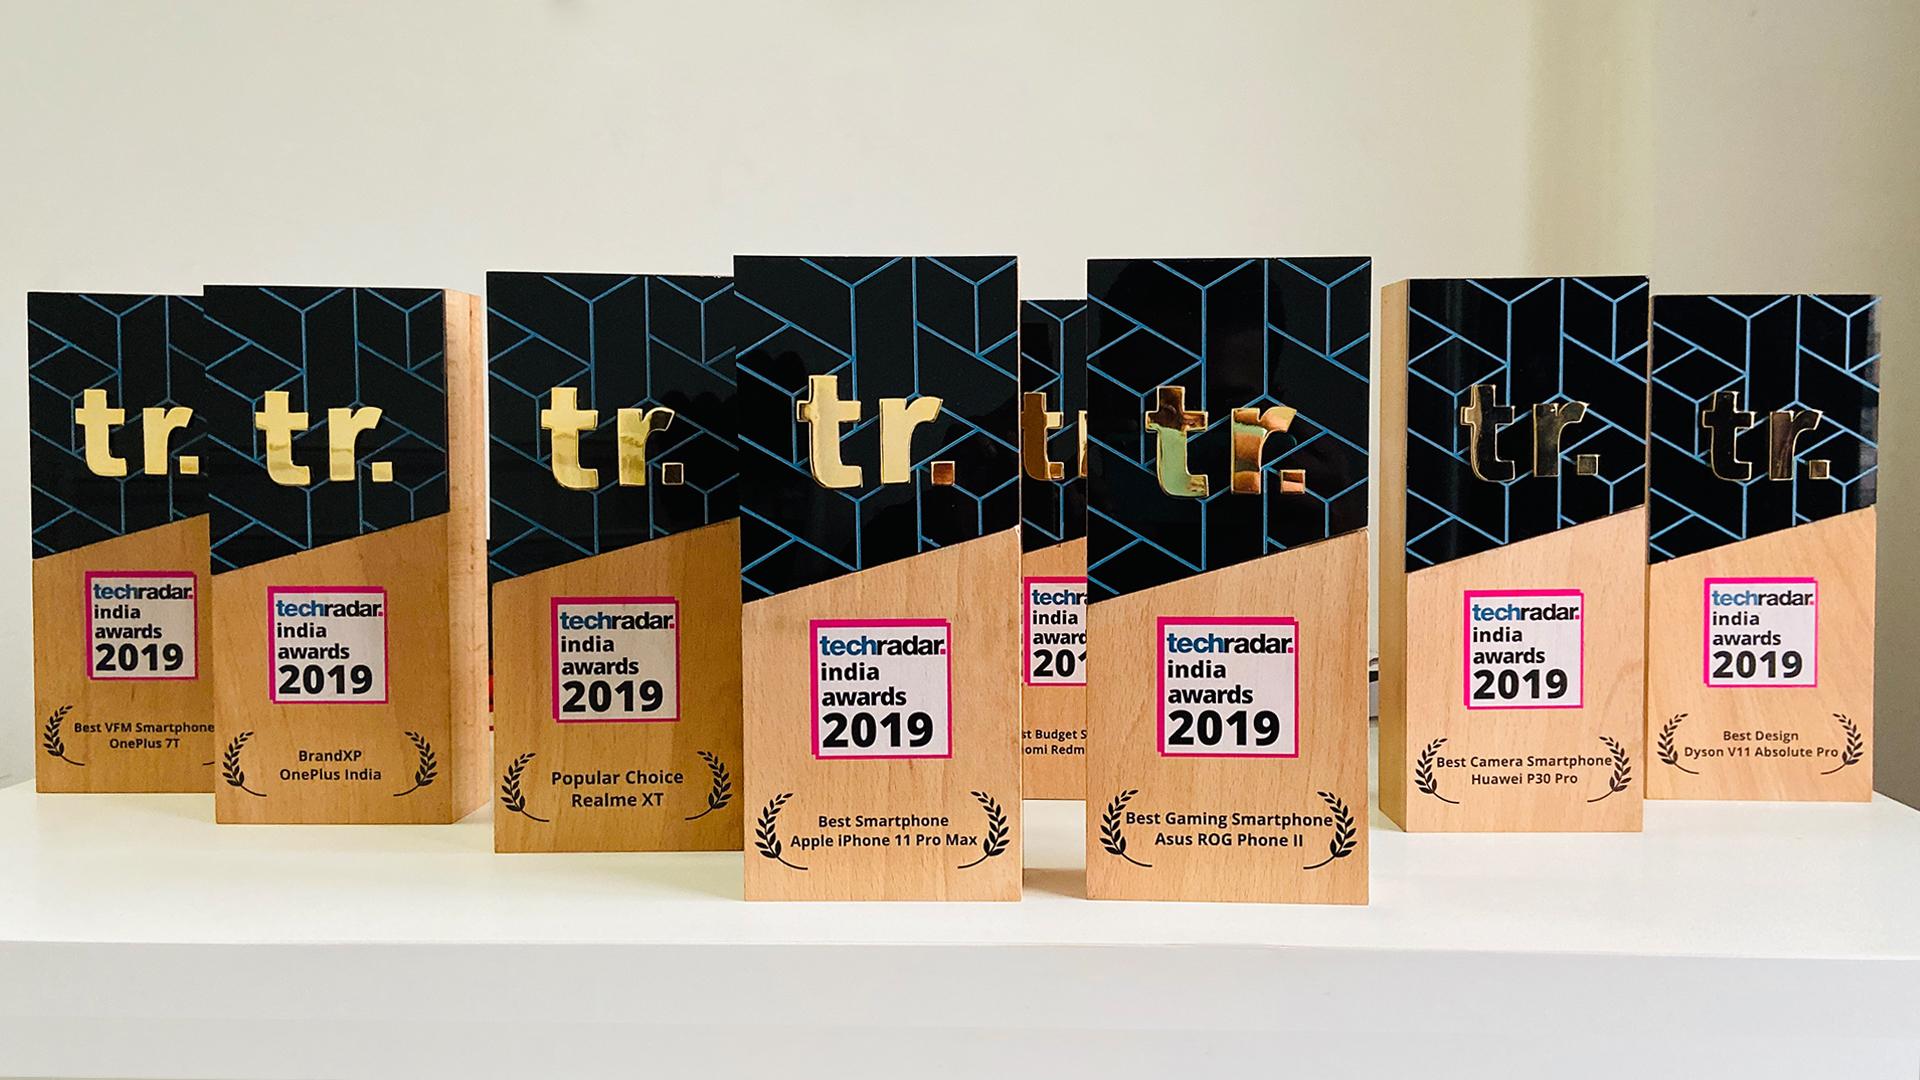 TechRadar India Awards 2019: The Winners